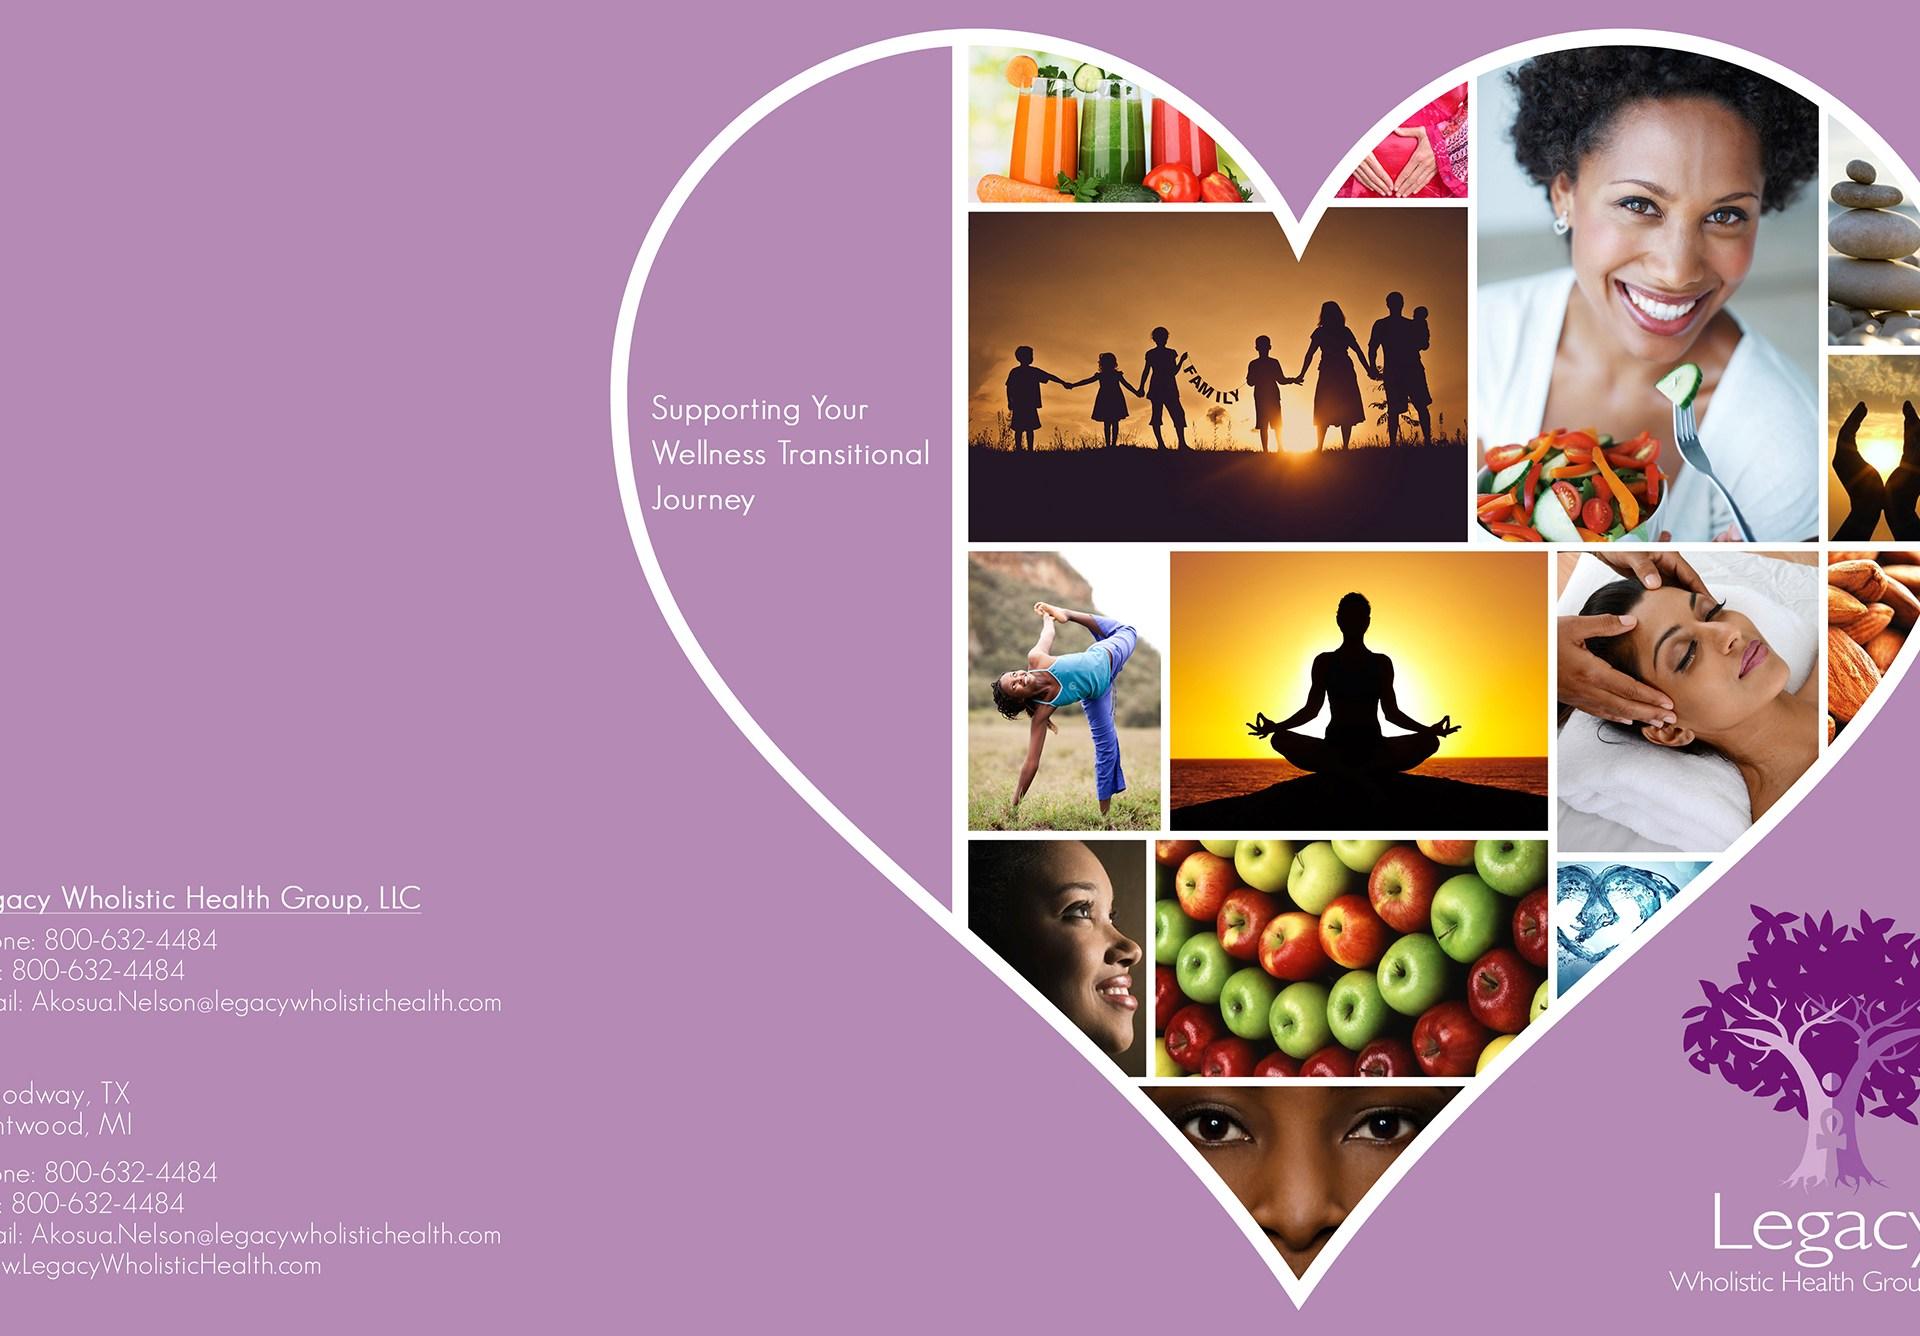 Legacy Wholistic Health Group Brochure